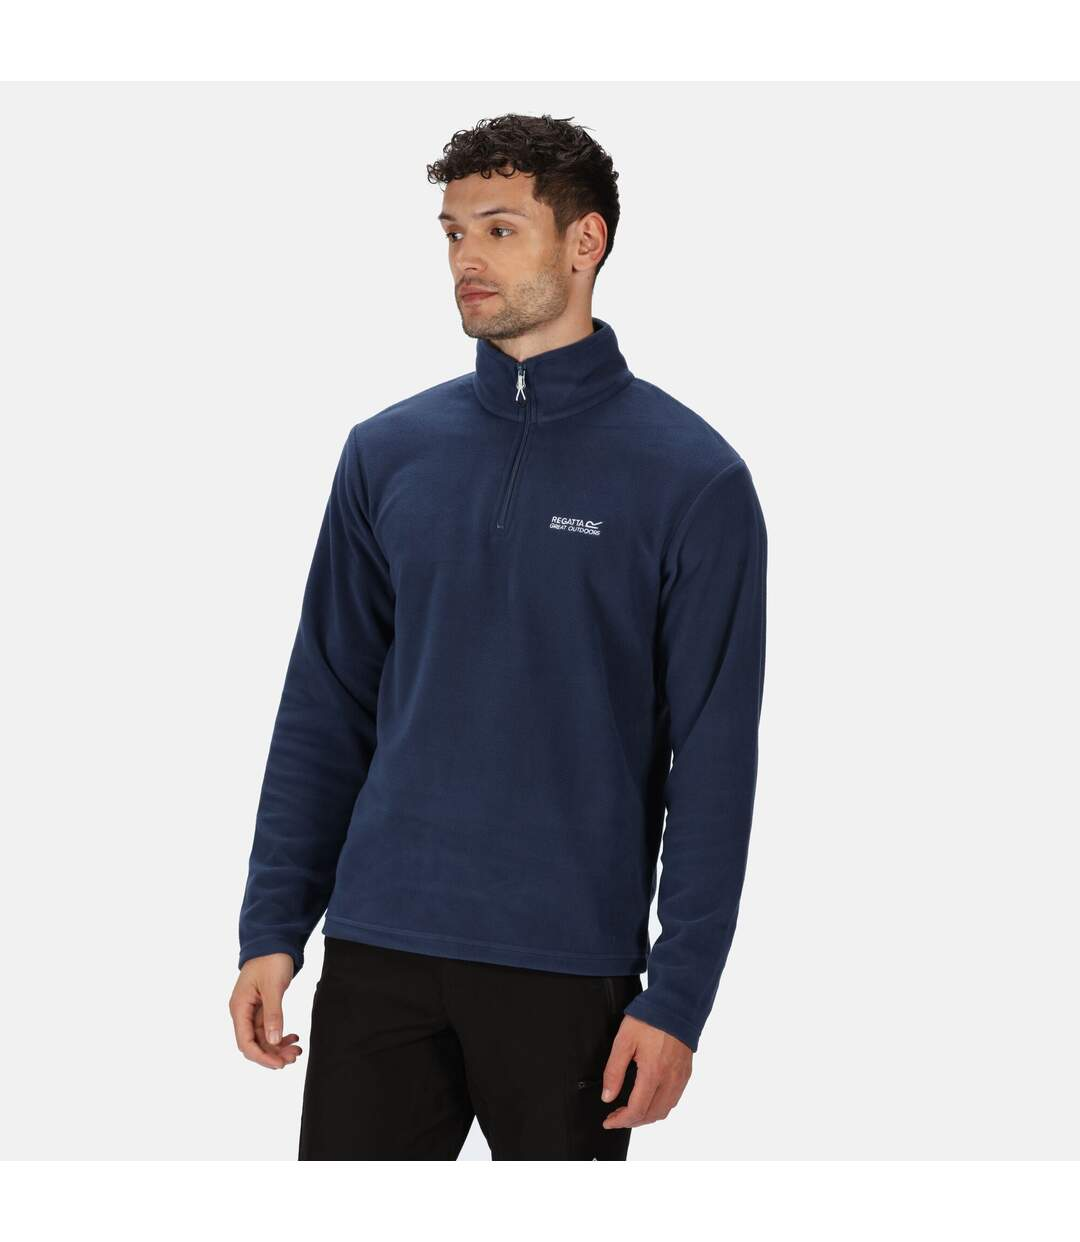 Regatta Great Outdoors Mens Thompson Half Zip Fleece Top (Brunswick Blue) - UTRG1390